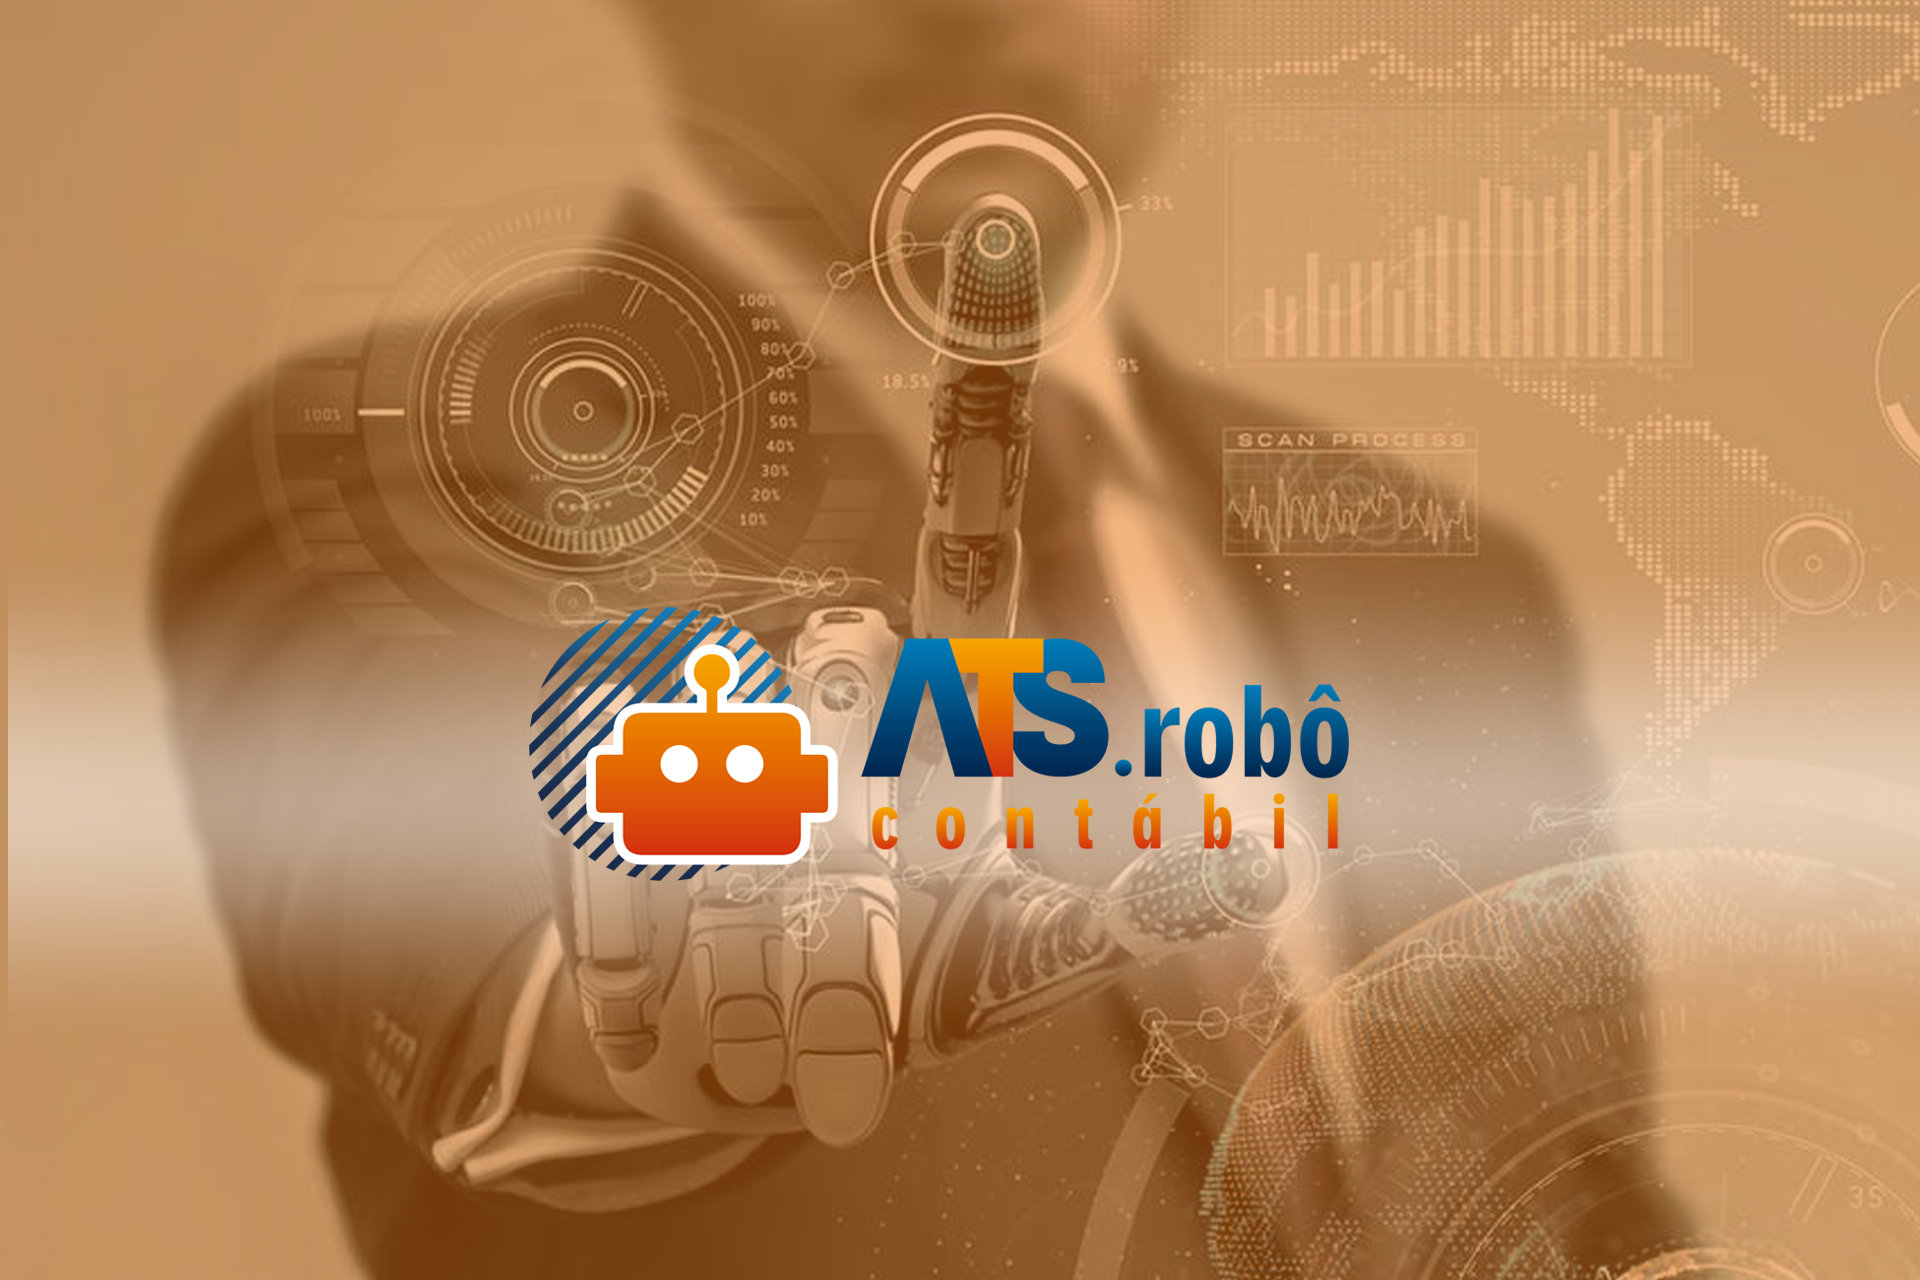 solução_robo_contábil___